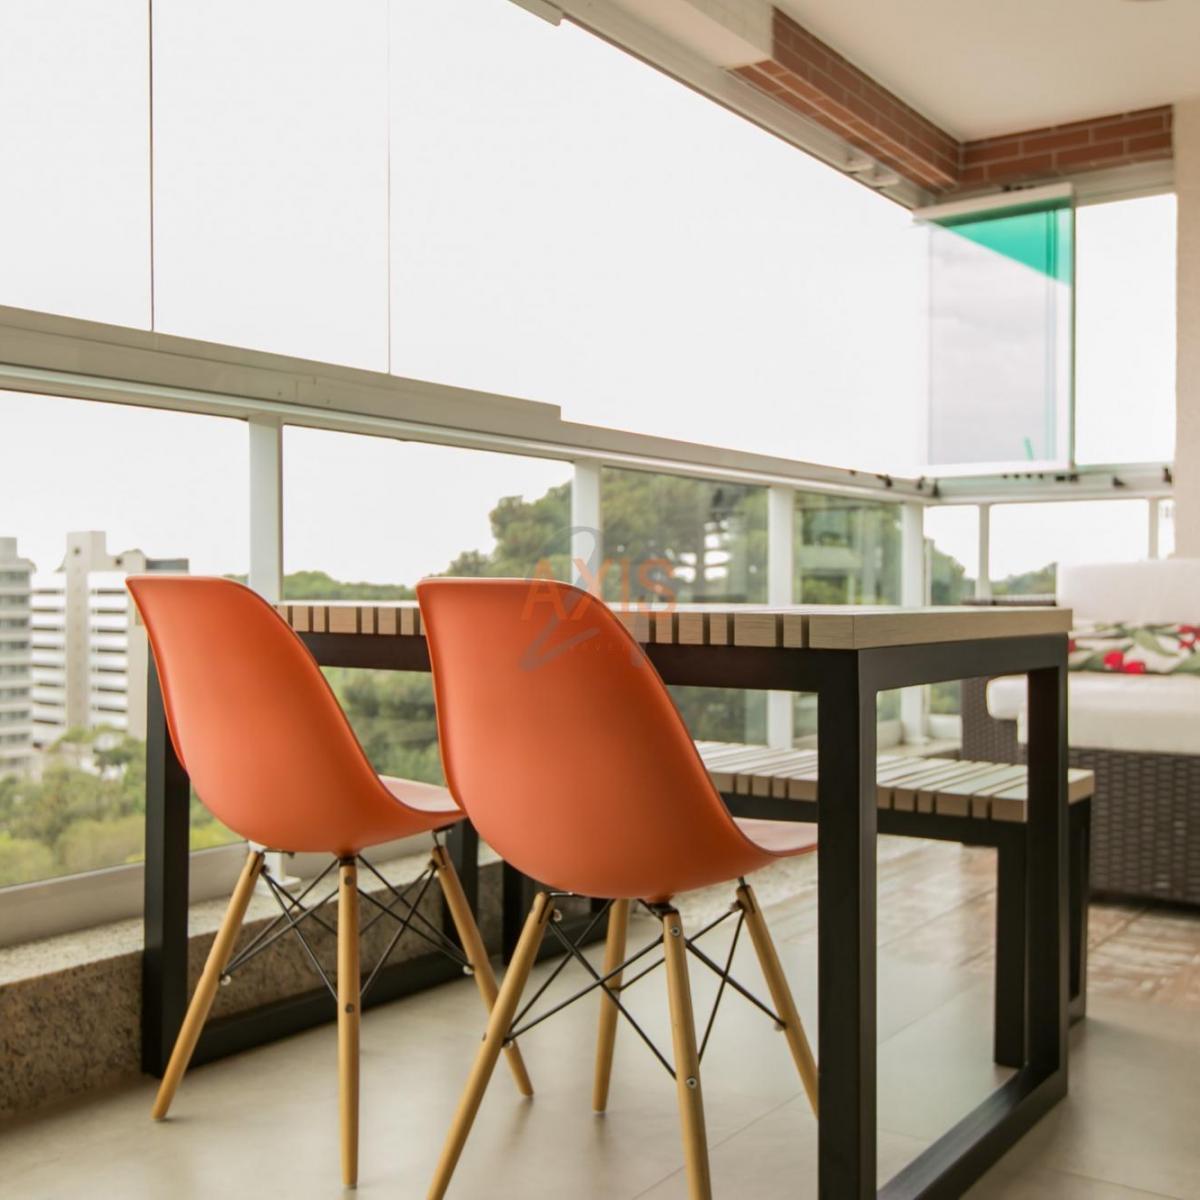 http://www.infocenterhost2.com.br/crm/fotosimovel/185478/52901168-apartamento-curitiba-ecoville_marcadagua.jpg